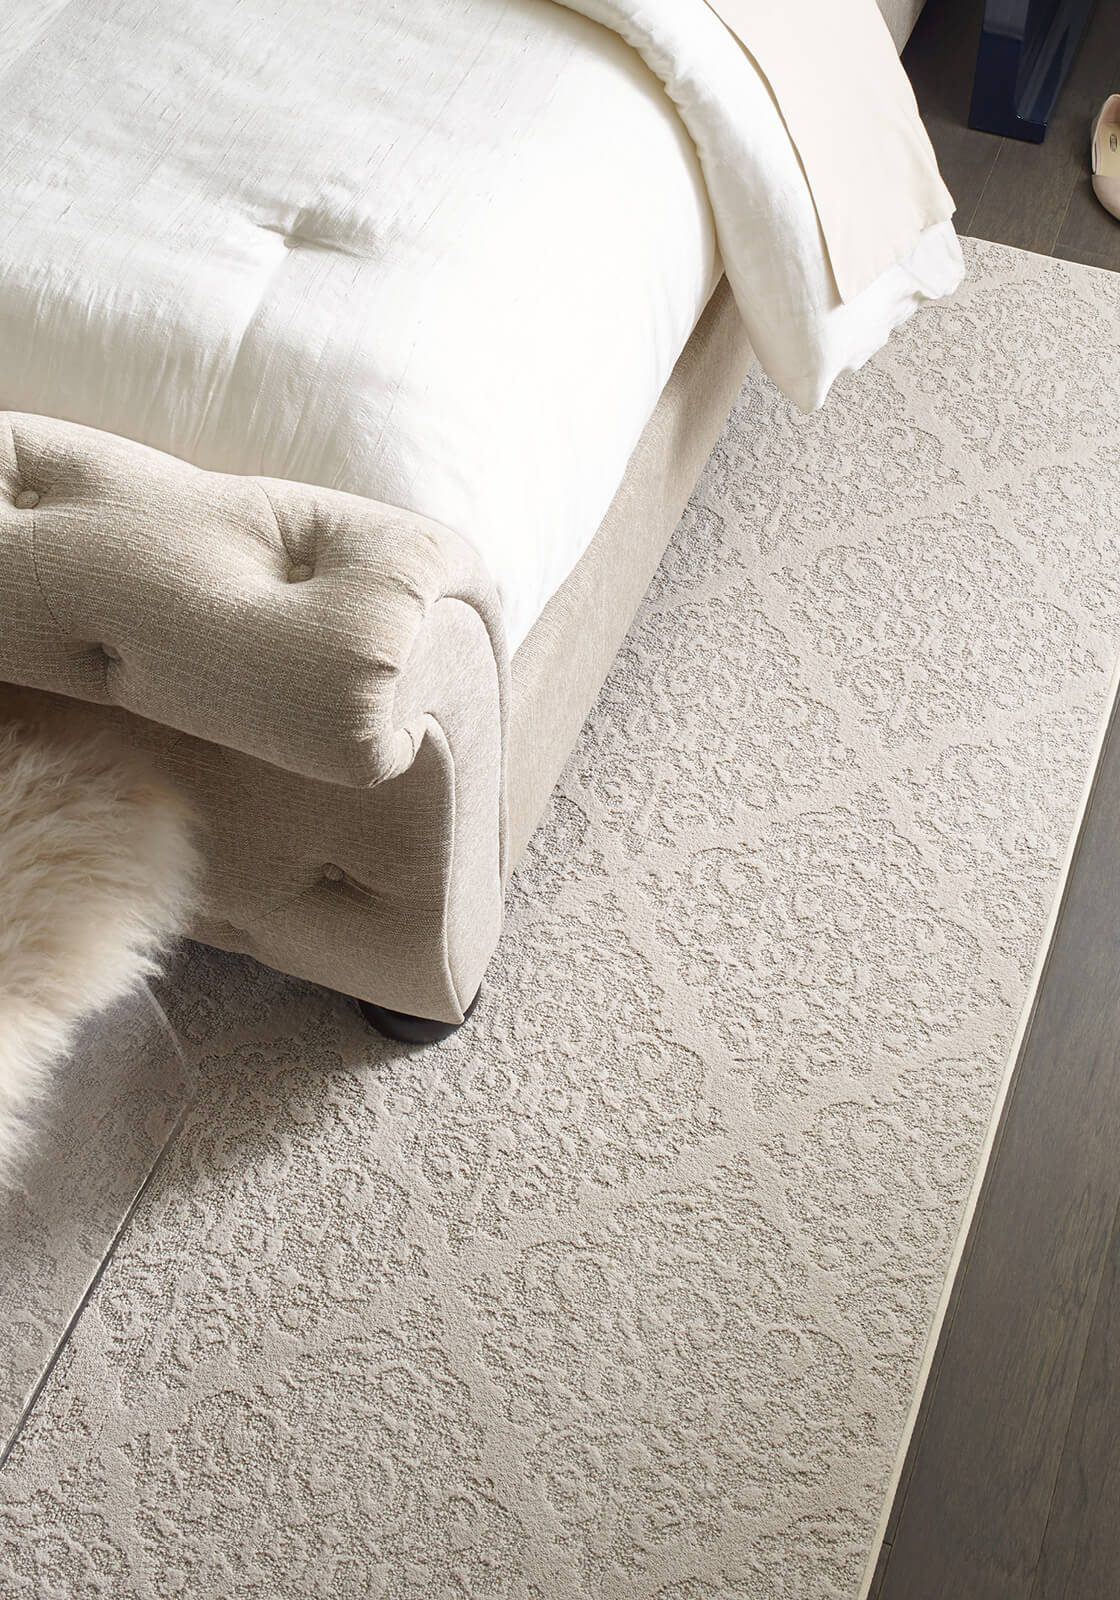 Northington Smooth-2W747-5054-Greystone-CCS73-Chateau Fare-00800-Urban Glamour Bedroom-Rug-Detail-V_1600x1600